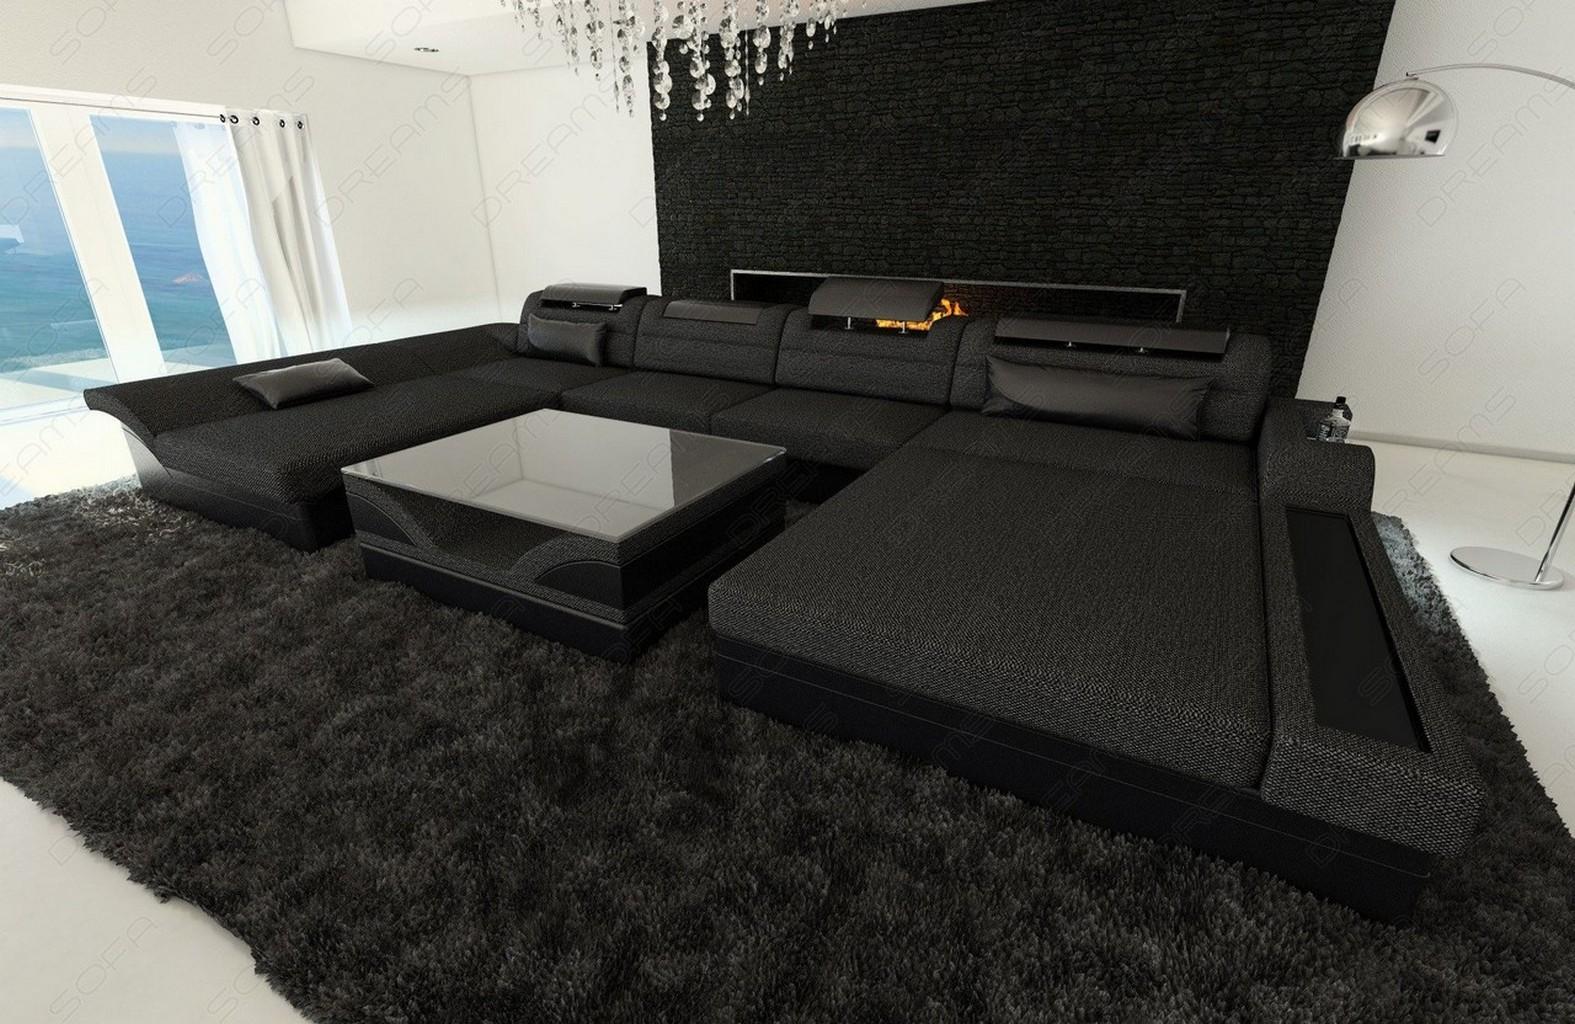 Wohnlandschaft design stoff monza u form grau luxus couch for Couch grau u form